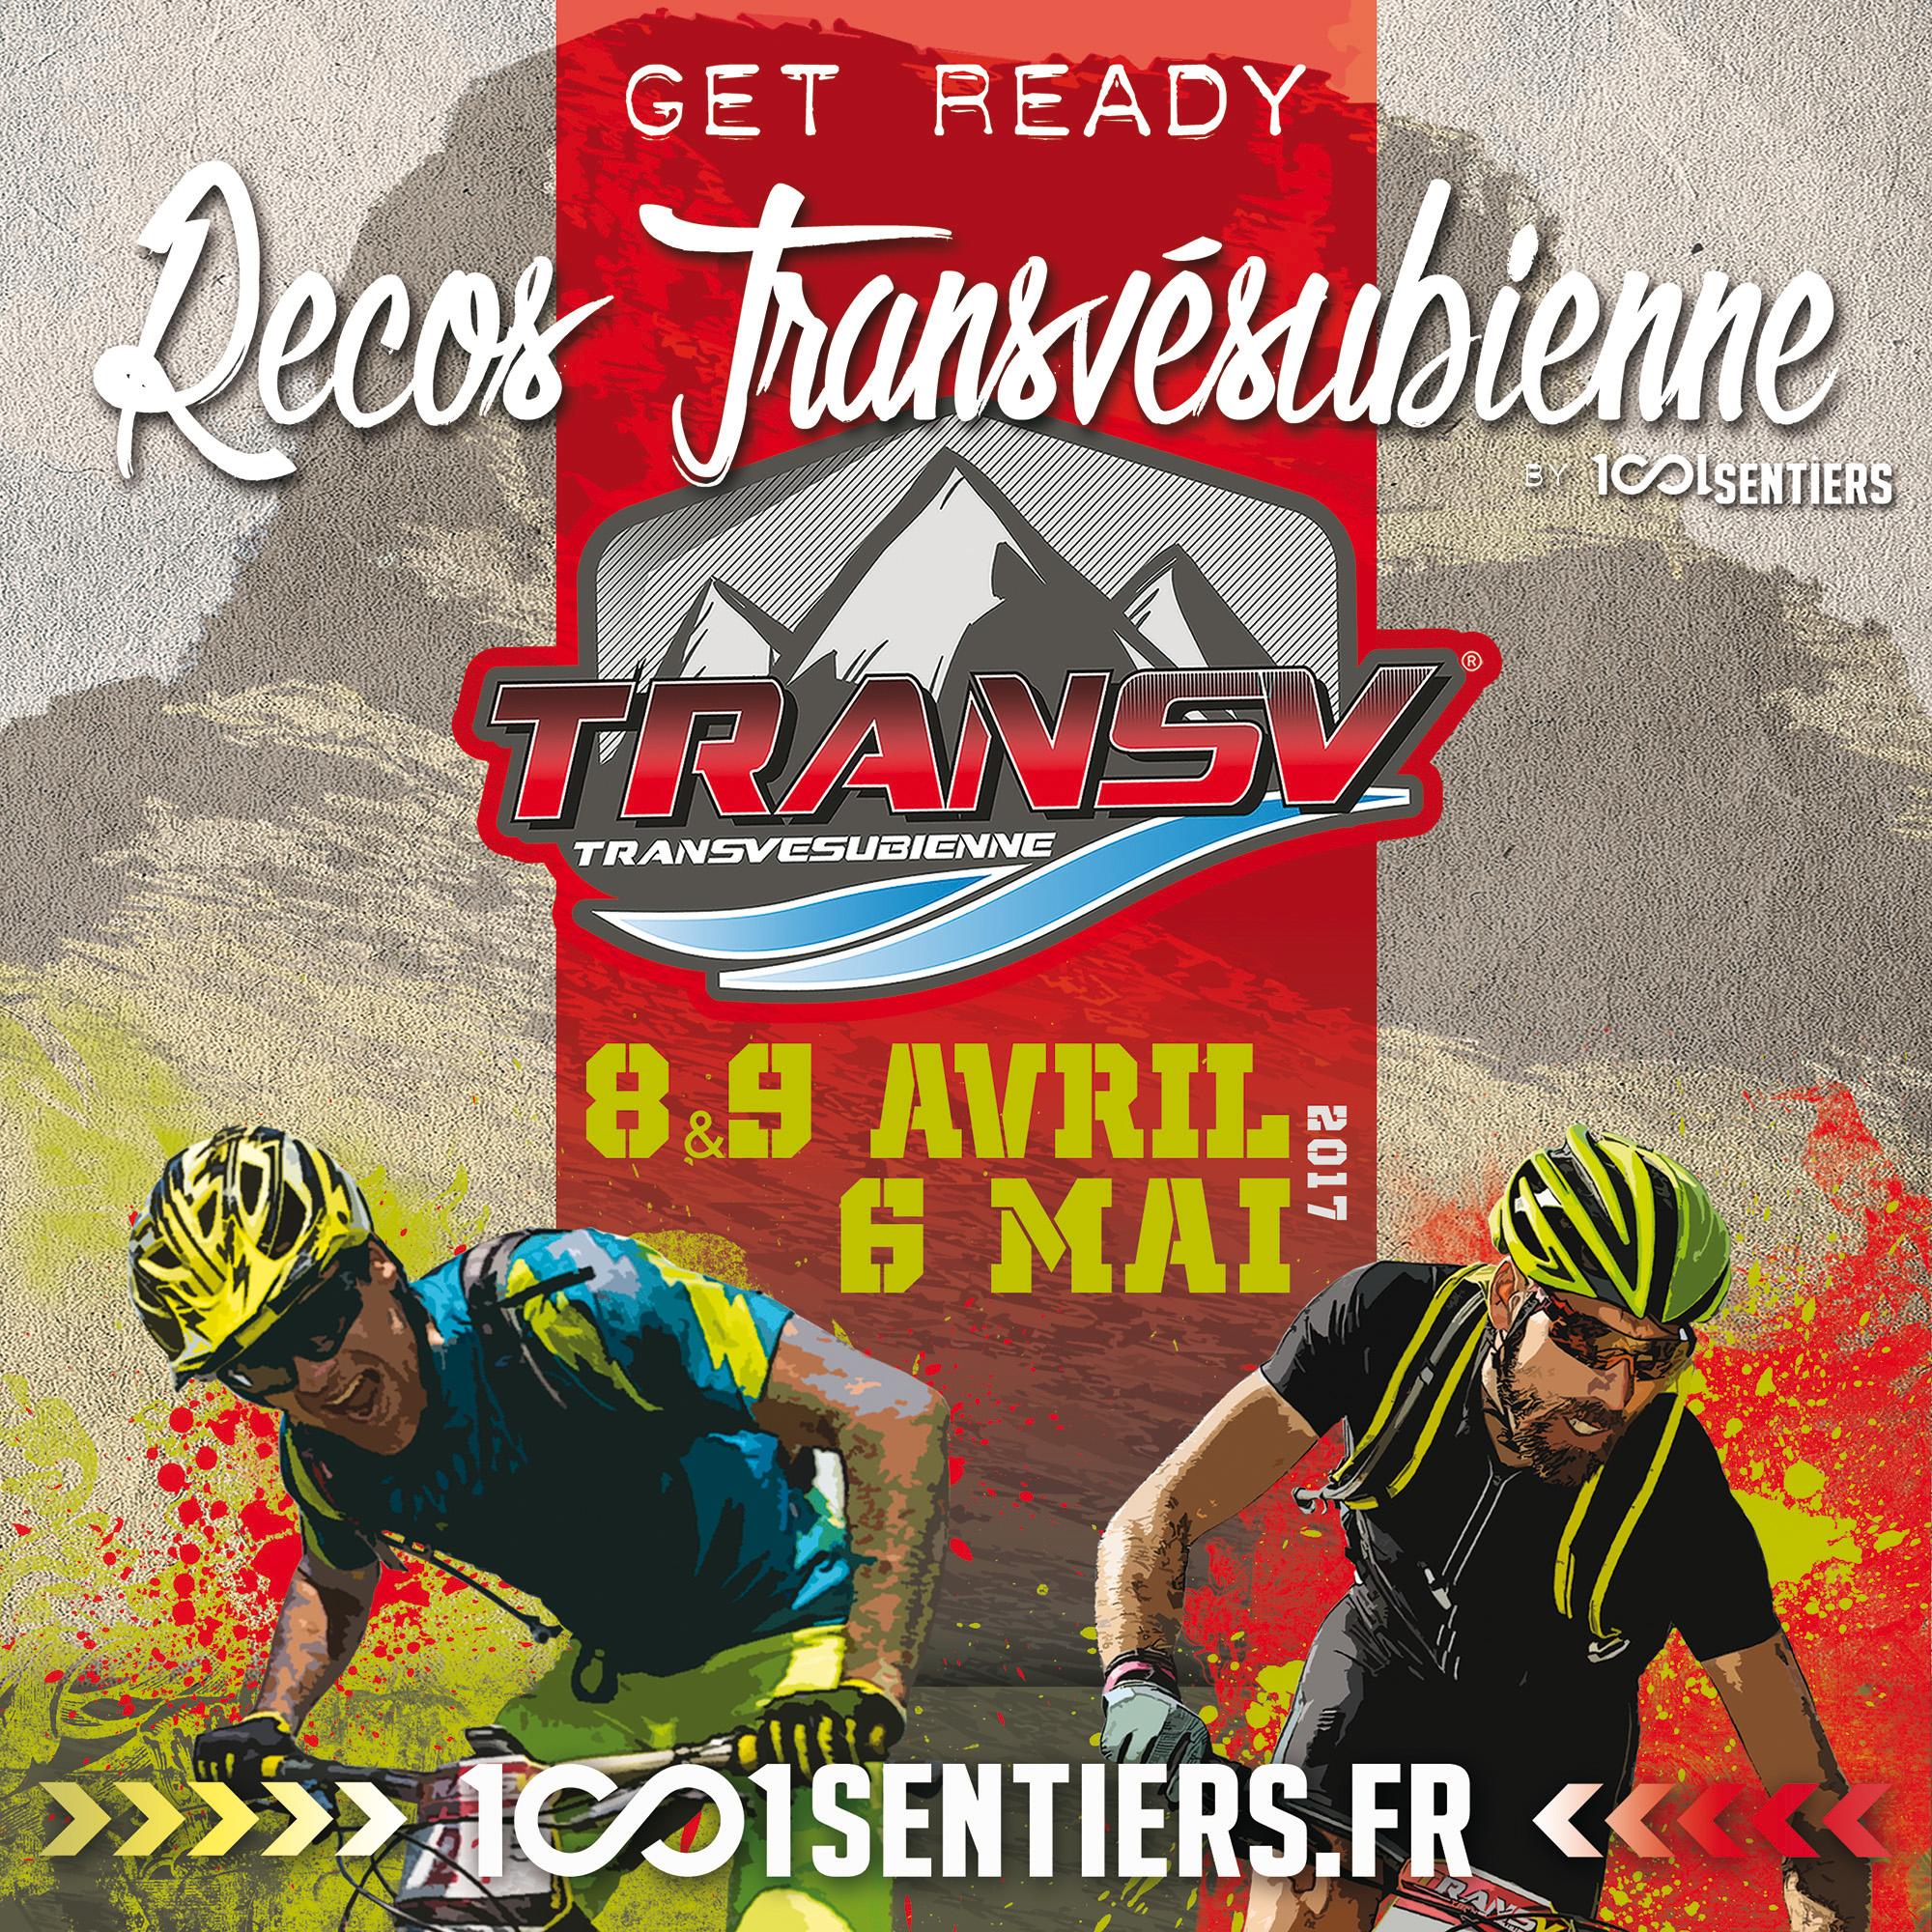 recos-transvesubienne_2017